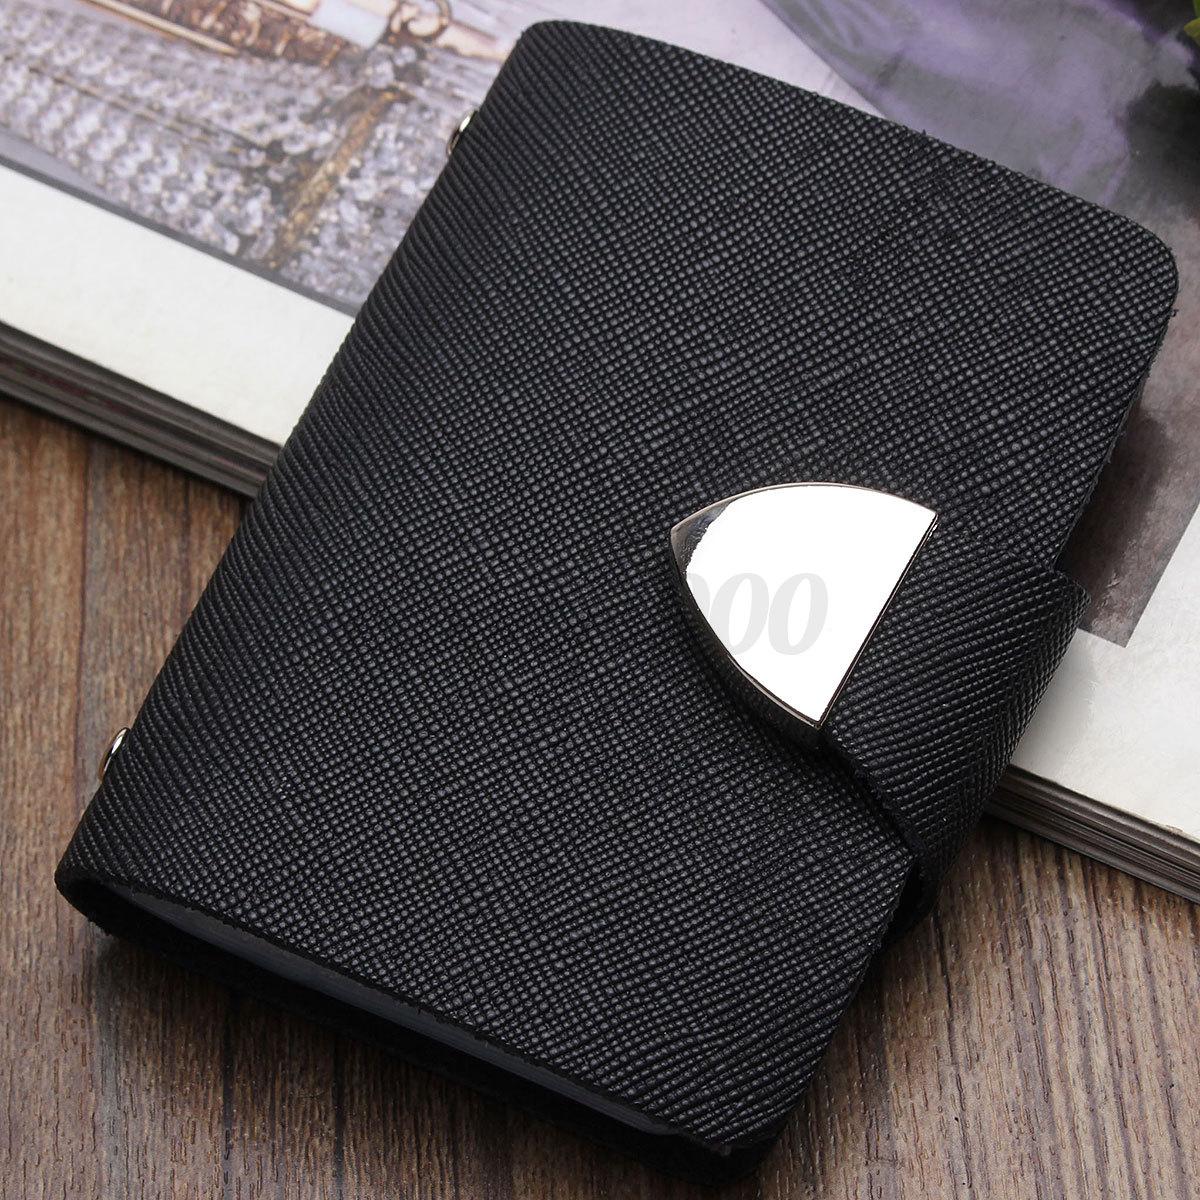 Cowhide Women Pouch ID Credit Card Holder Wallet Cash Organizer Case Box Pocket